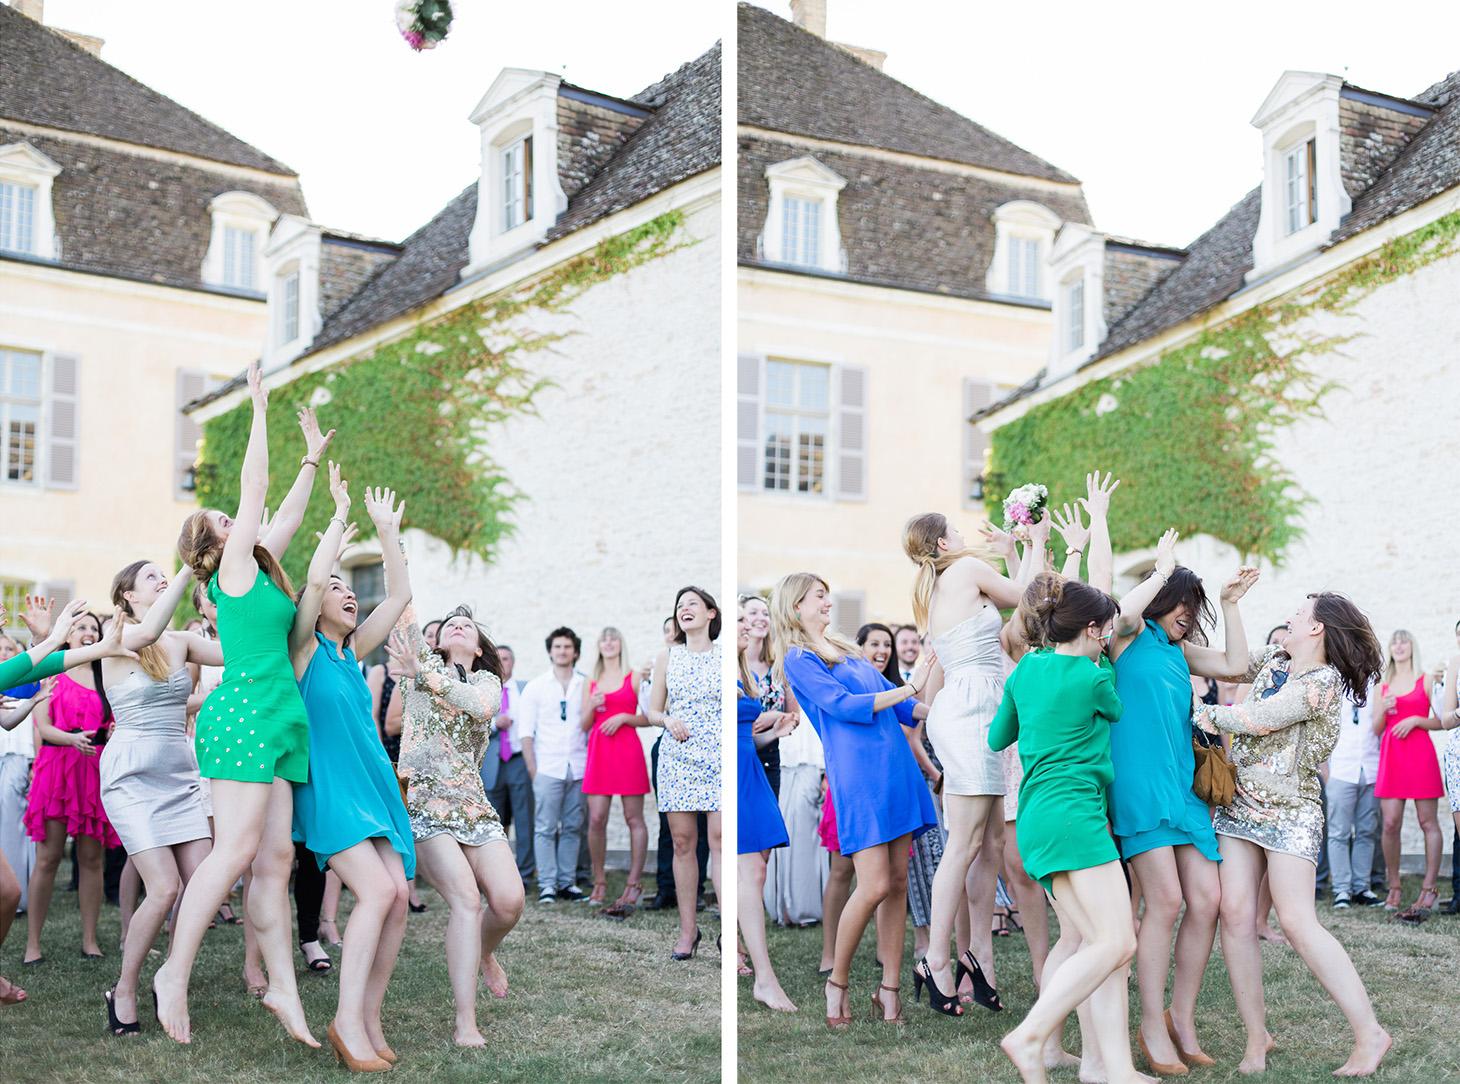 bourgogne_wedding_photographer_chateau_pommard-079 copie